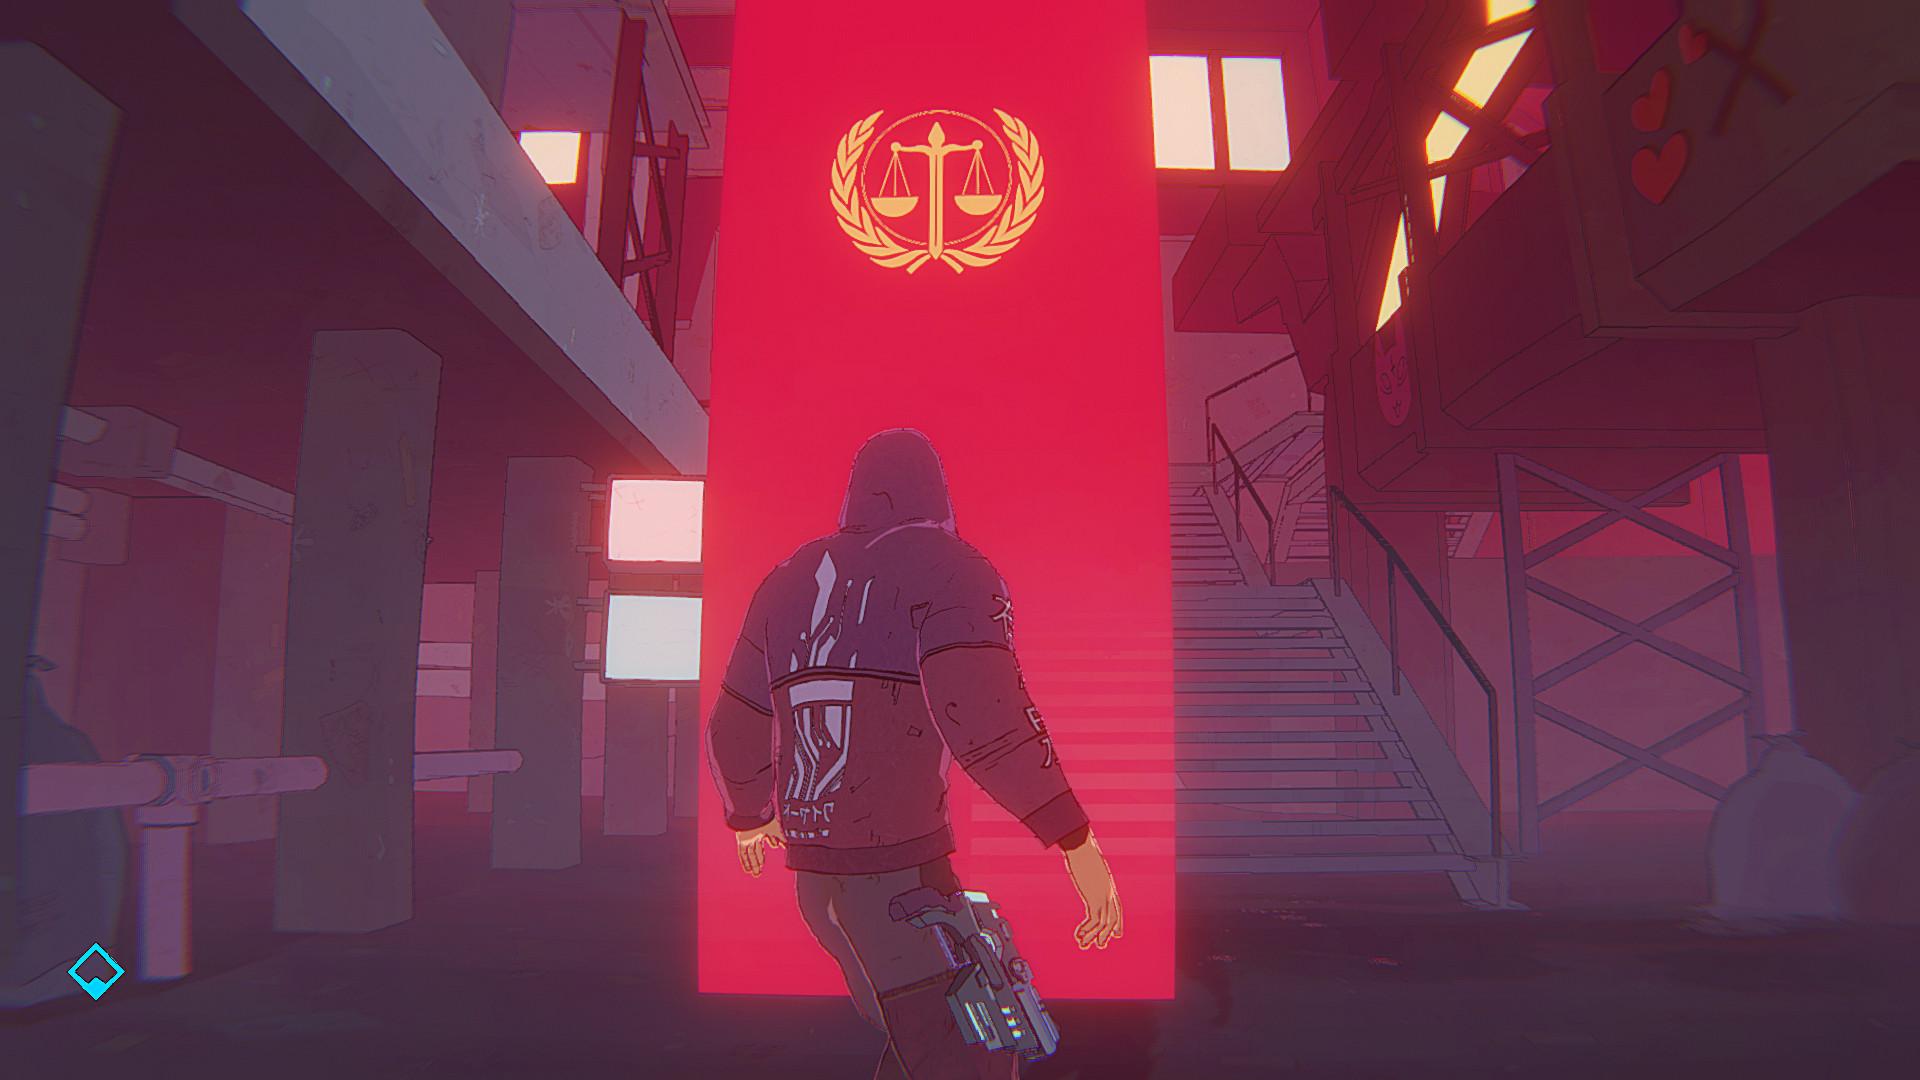 Foreclosed: Novo game cyberpunk é anunciado